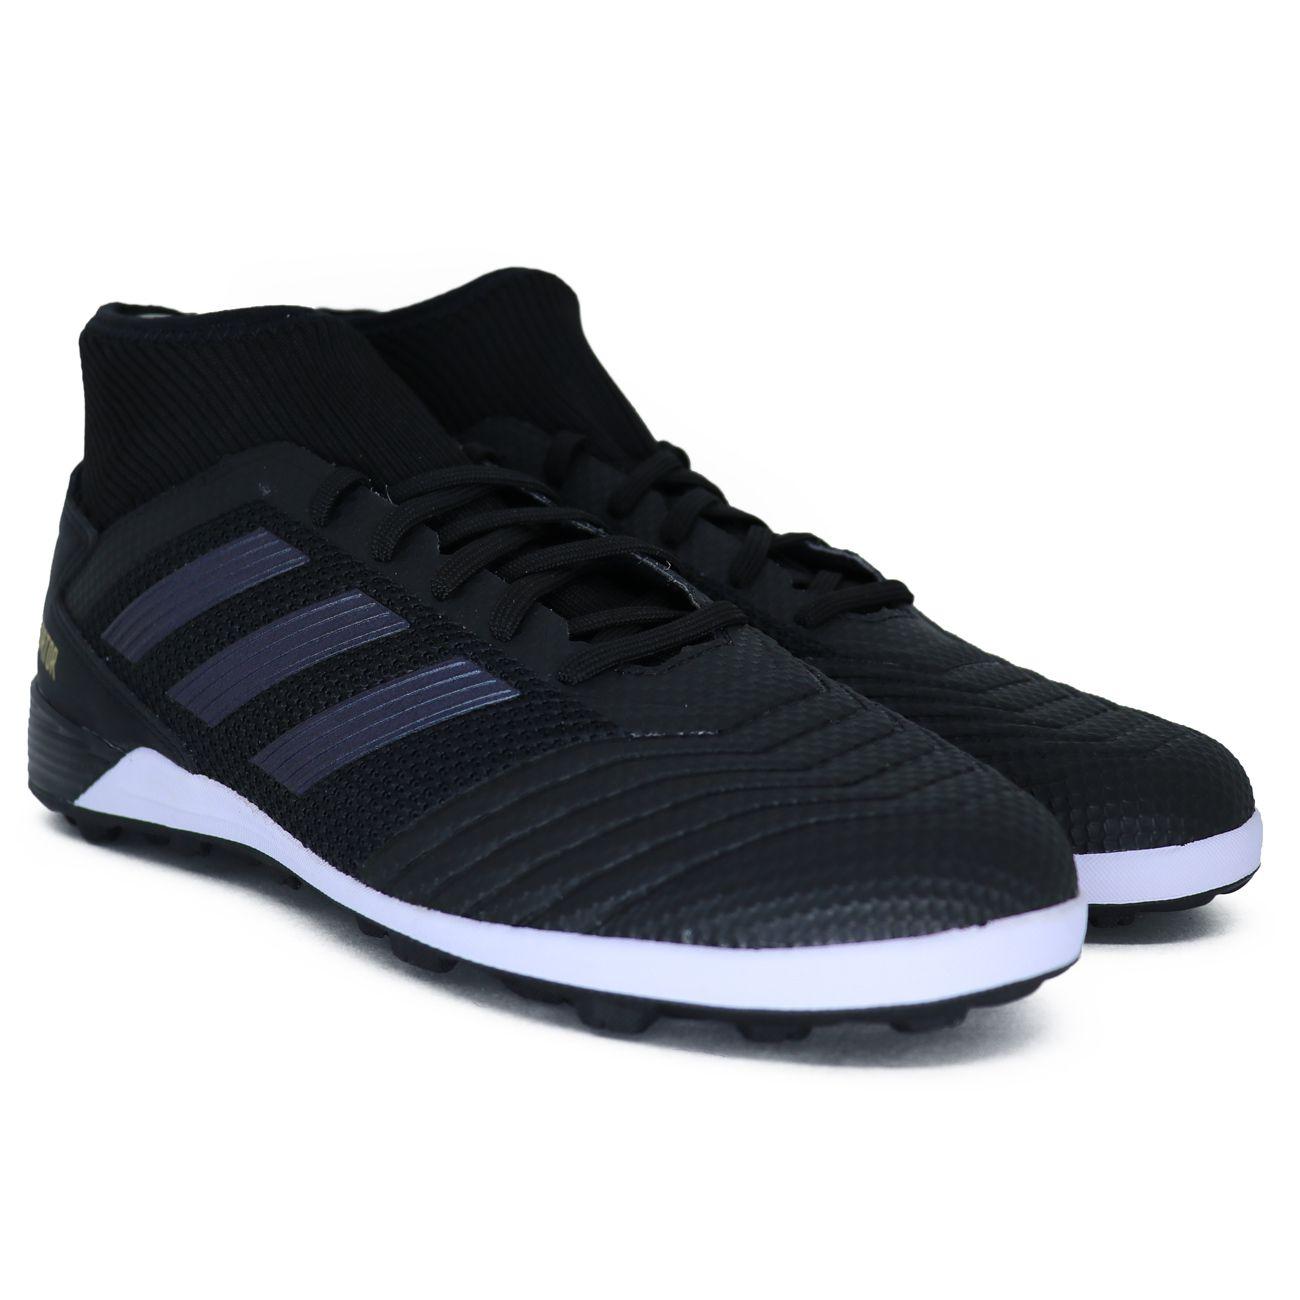 Chuteira Society Adidas Predator 19 3 TF - Preto